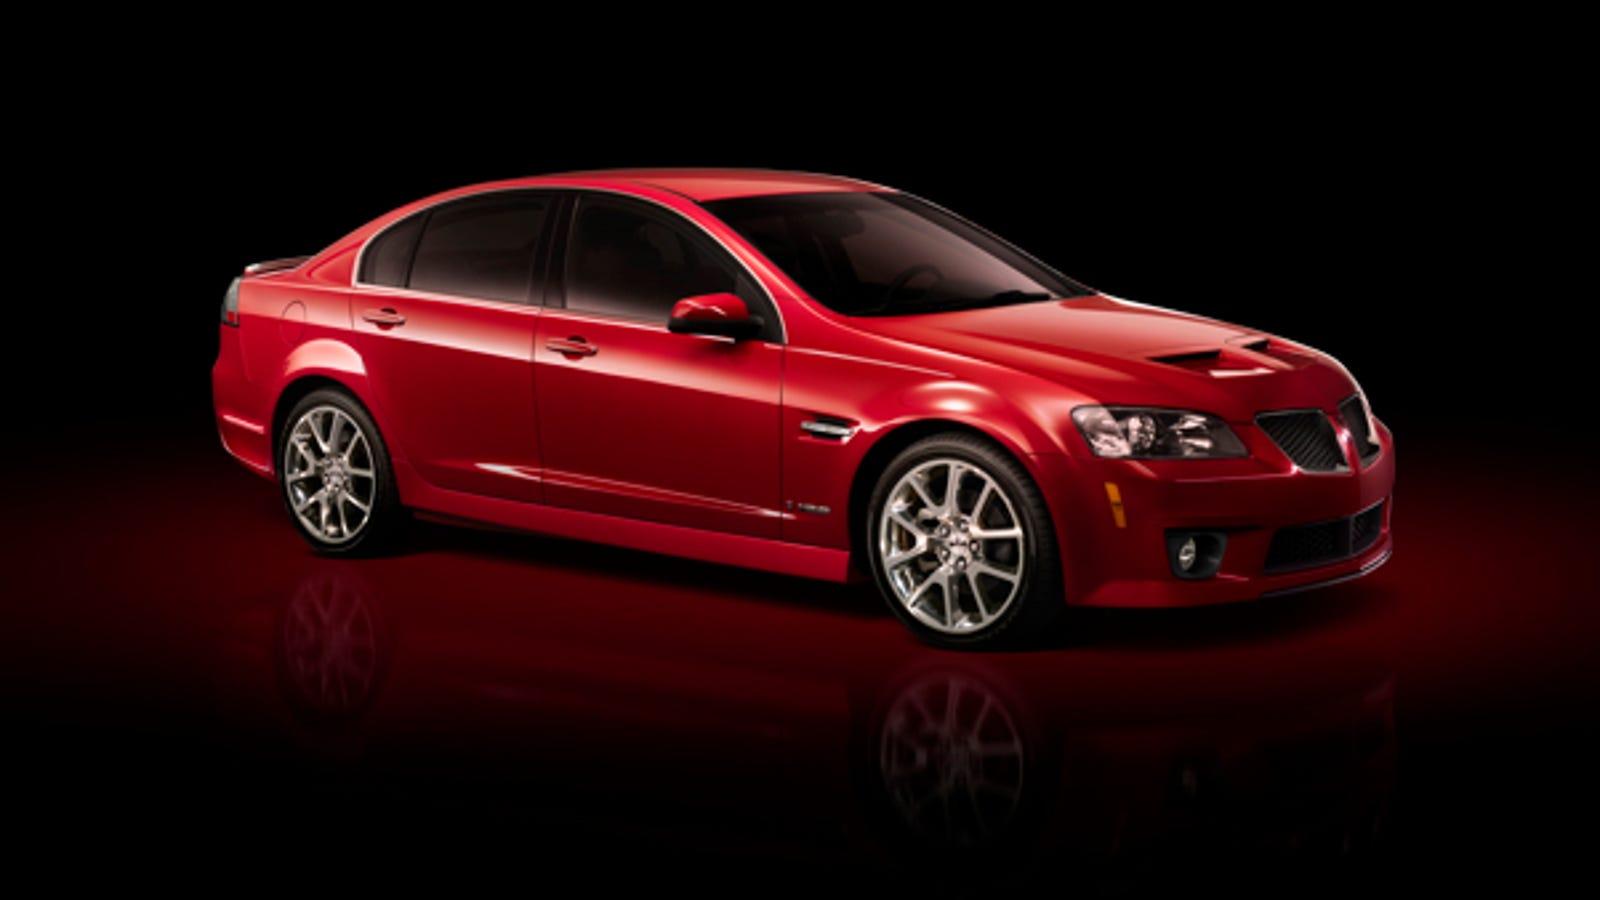 2009 Pontiac G8 GXP Revealed, Gets Corvette LS3 Power And A Manual  Transmission